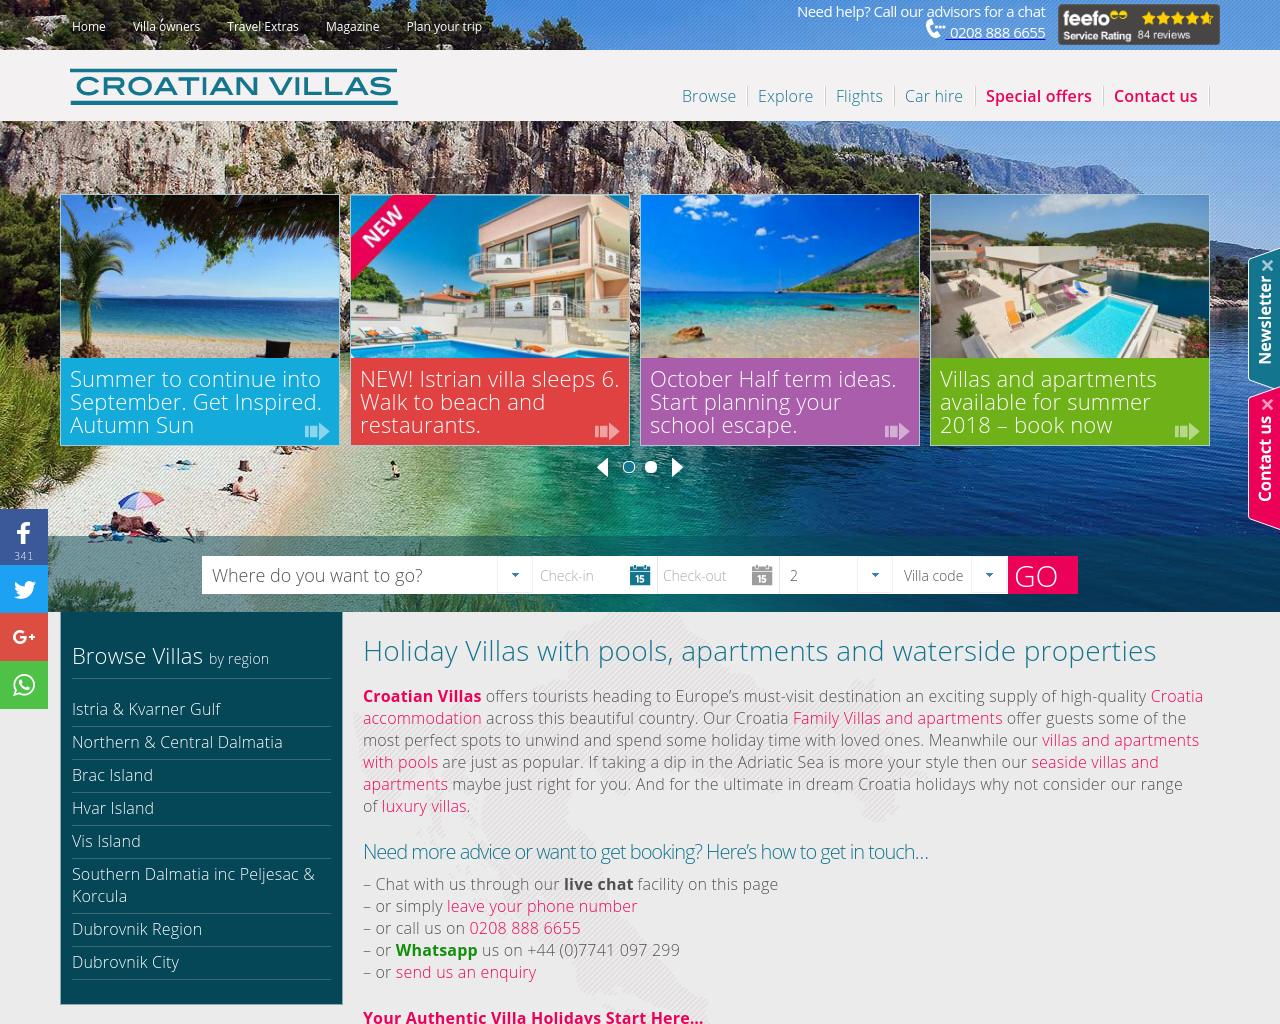 Croatian-Villas-Advertising-Reviews-Pricing